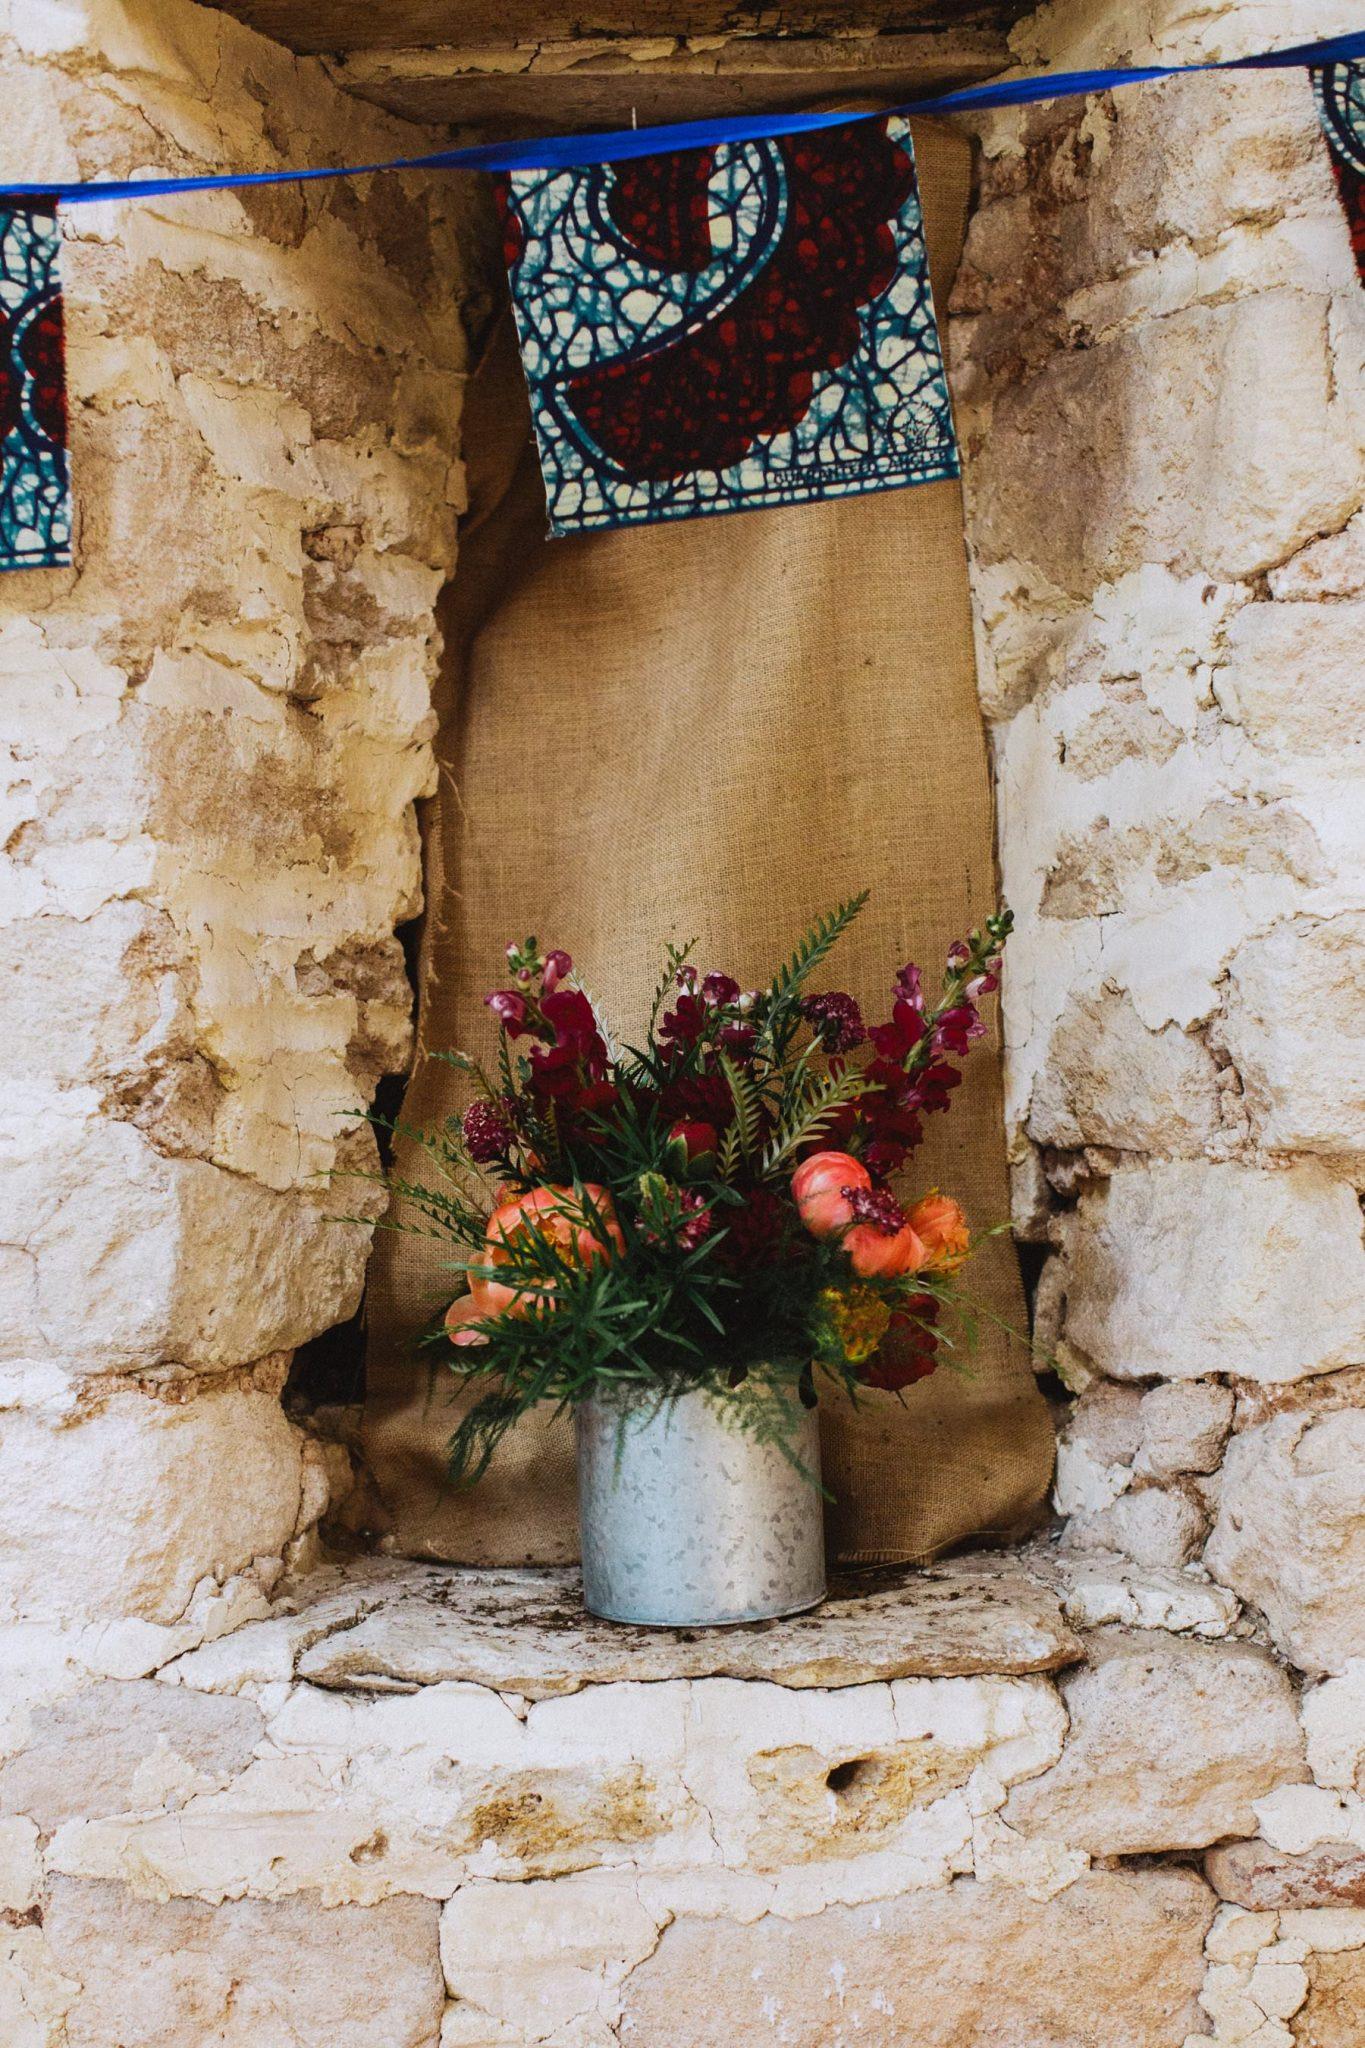 floral arrangement in ceremony room of bath wedding